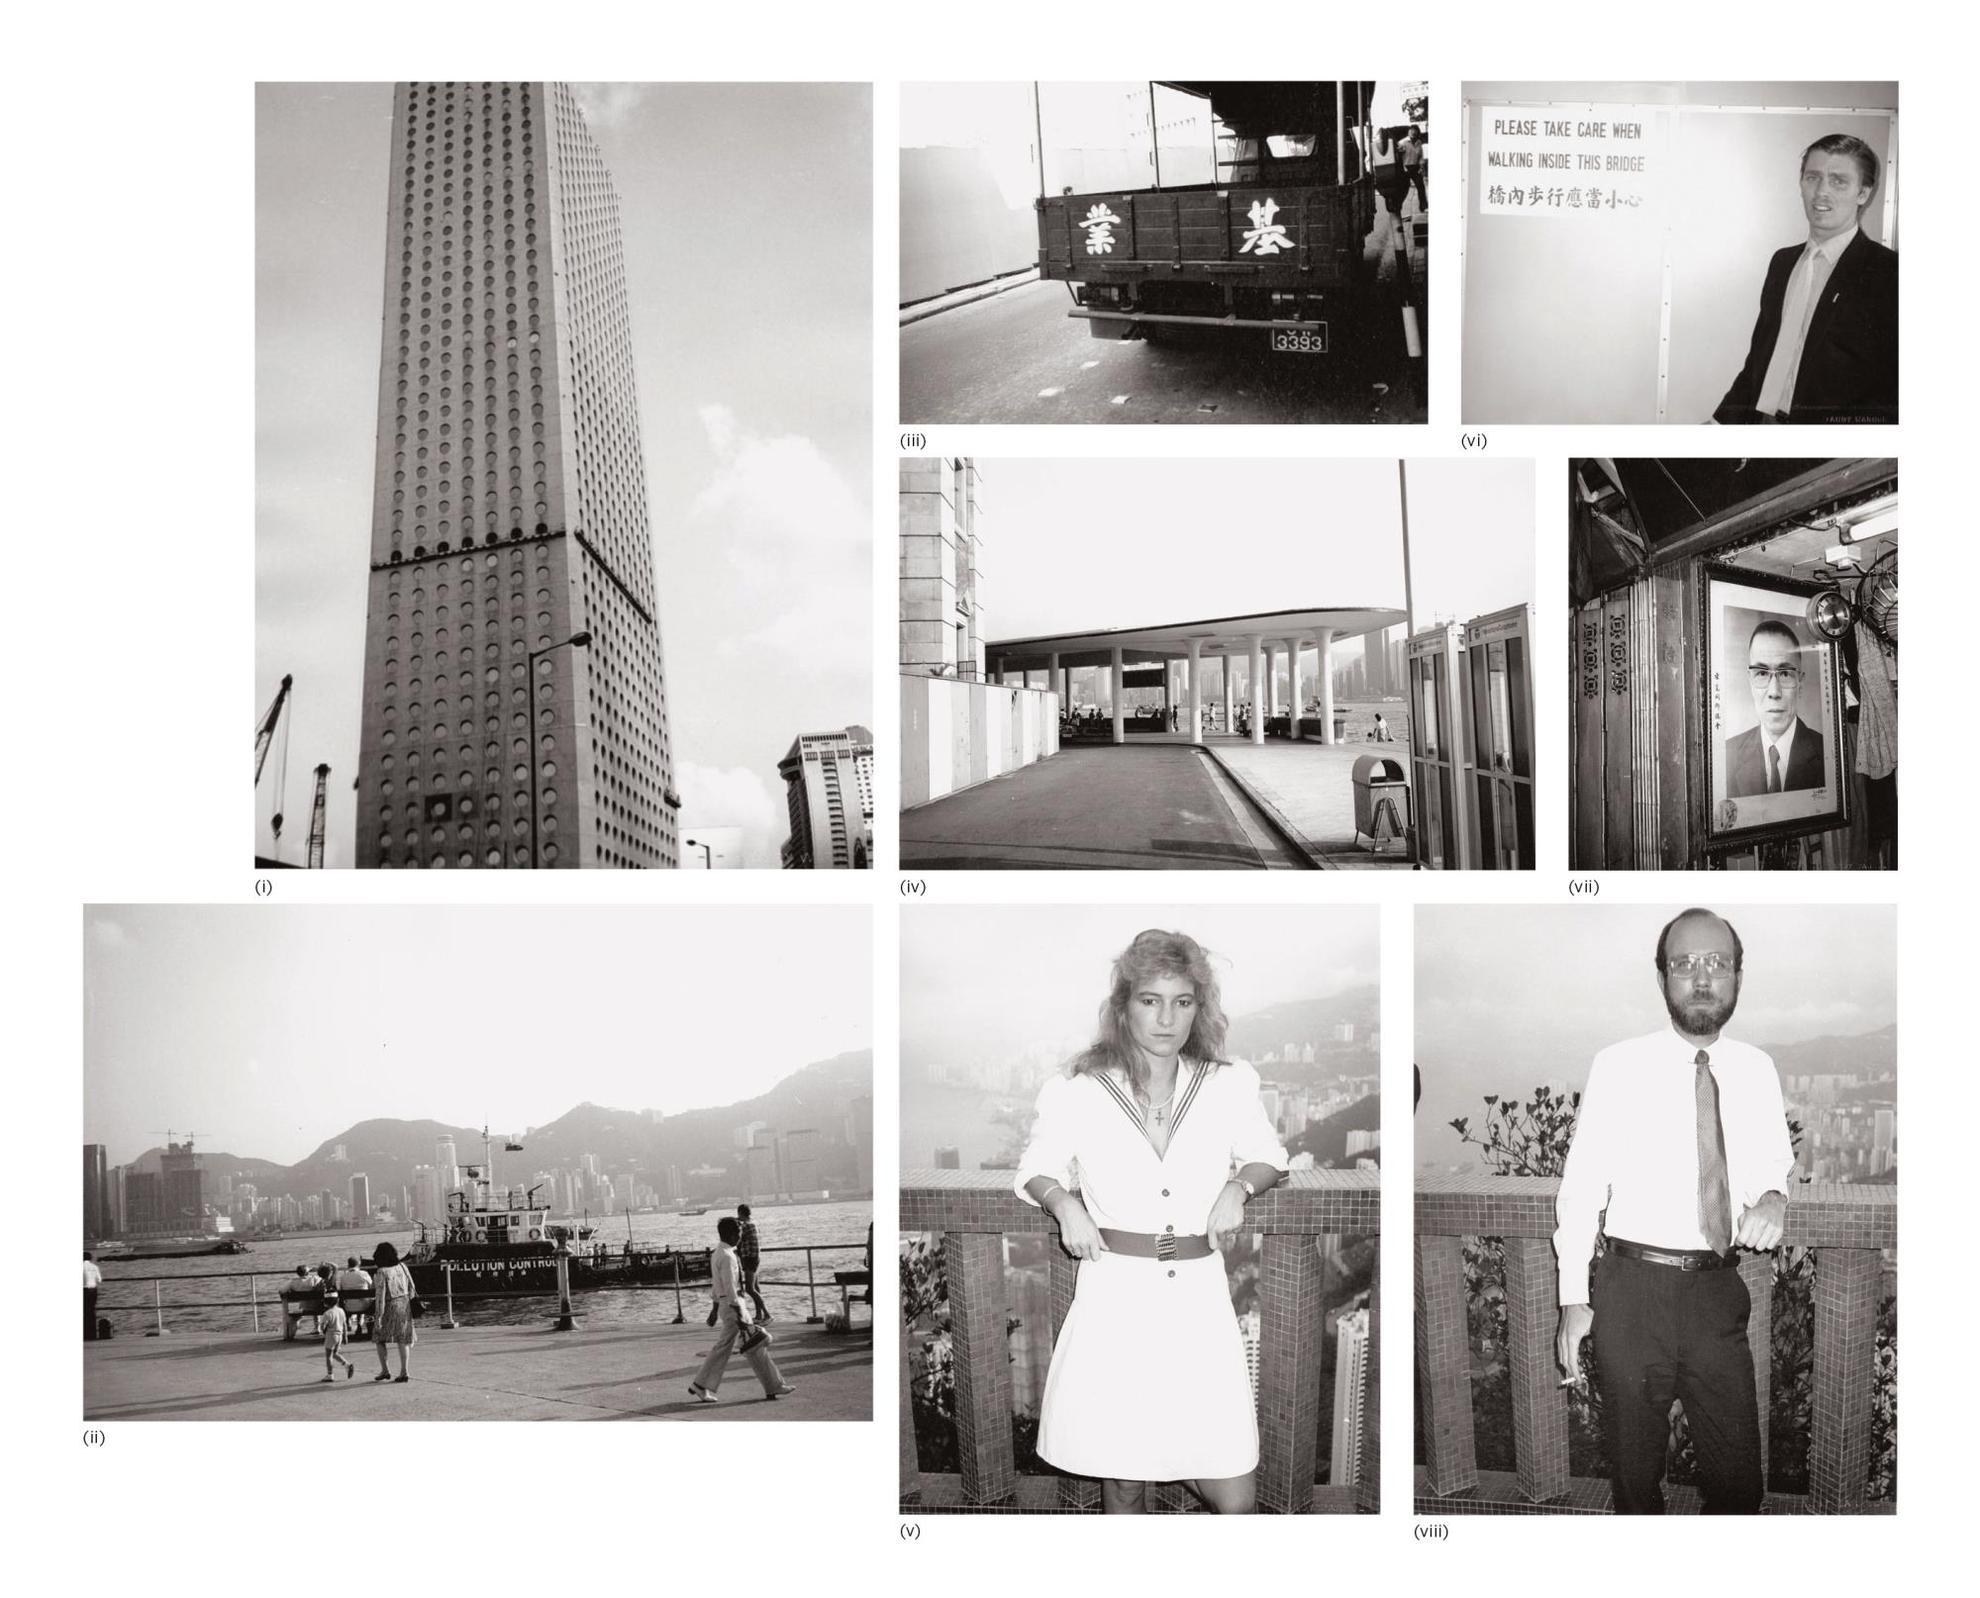 Andy Warhol-Eight Works: (I) Hong Kong Buildings; (II) Hong Kong Harbour; (III) Hong Kong Street (Truck); (IV) Hong Kong Harbour; (V) Natasha Grenfell; (VI) Christopher Makos; (VII) Picture Of A Man; (VIII) Patrick Cooney-1982